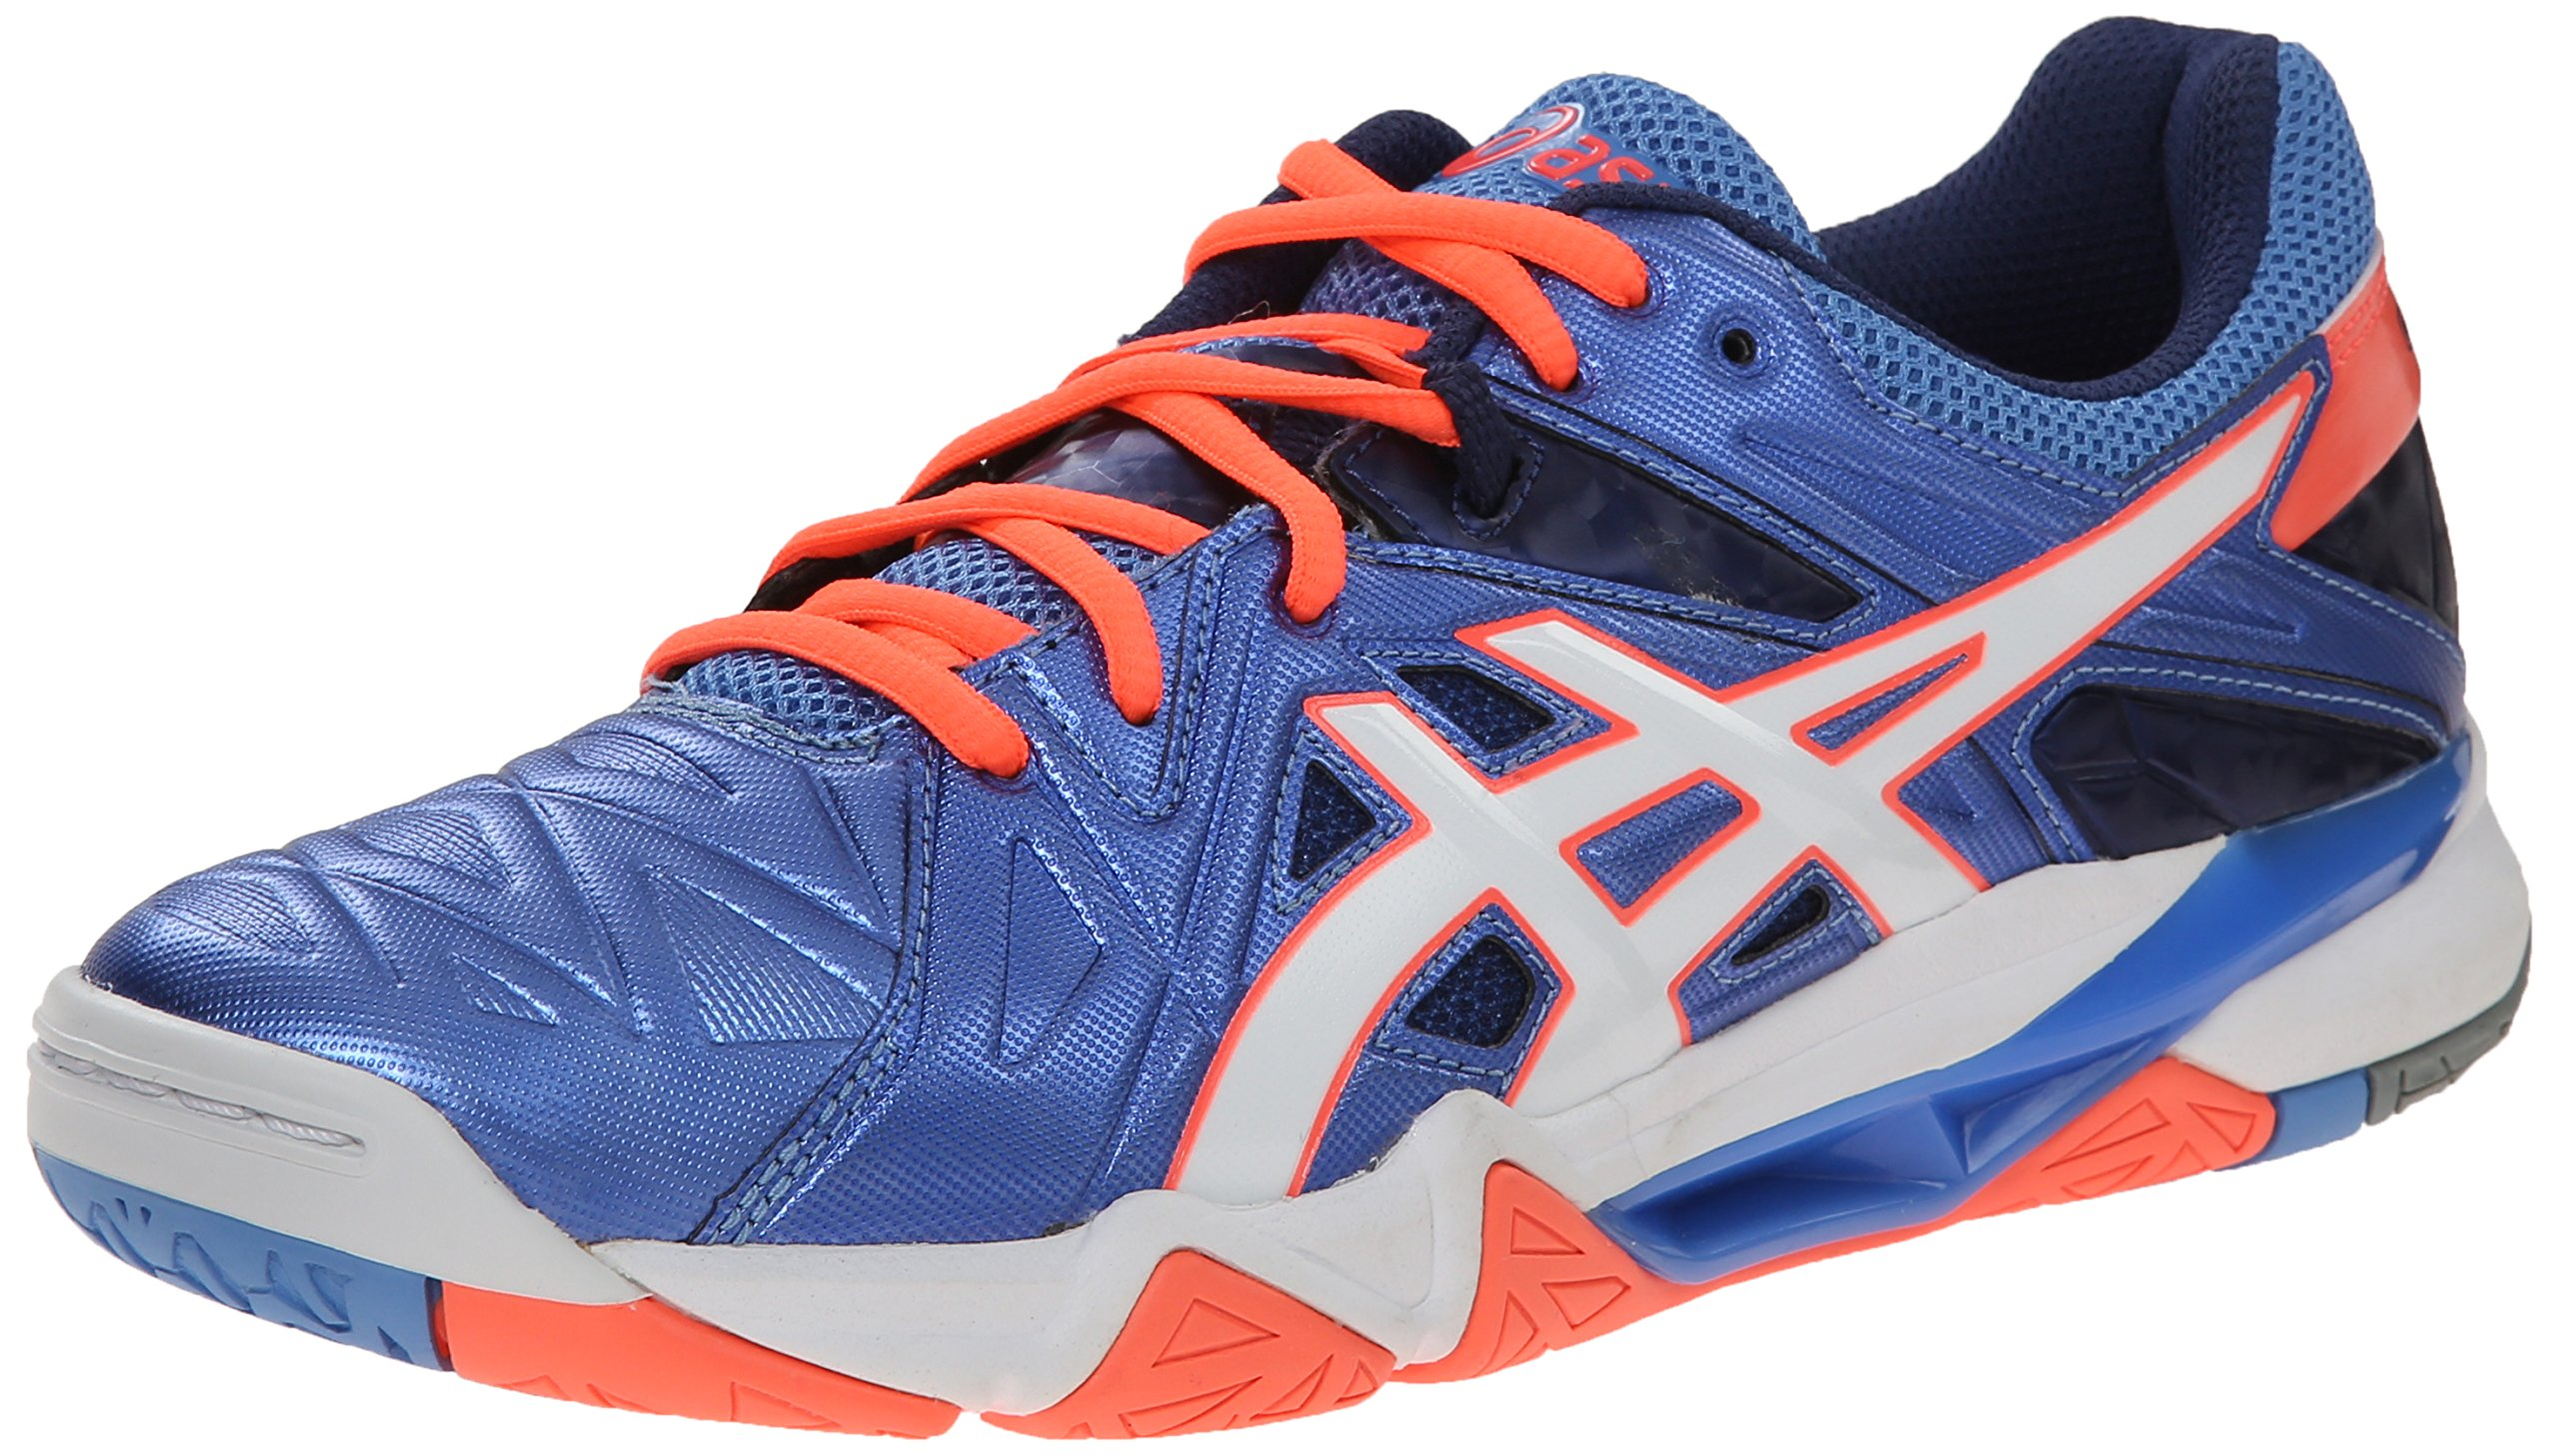 ASICS Women's Gel Cyber Sensei Volleyball Shoe, Powder Blue/White/Coral, 8 M US